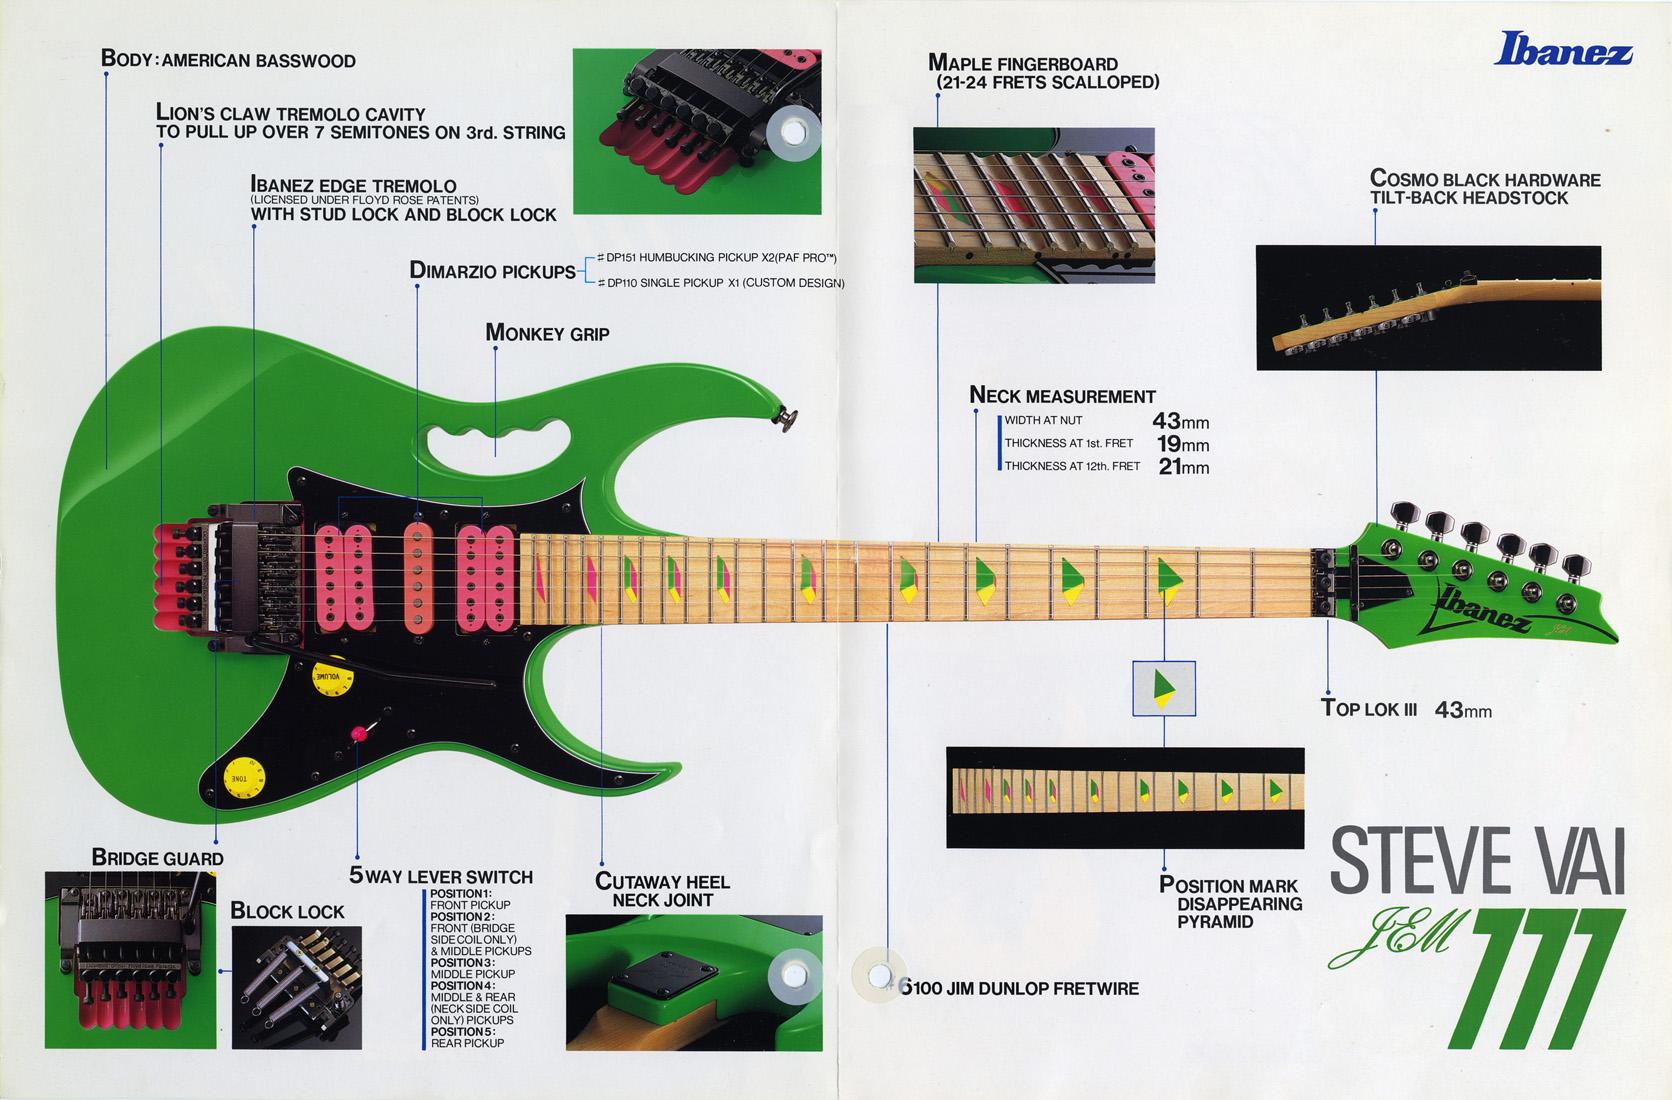 Pickup Wiring Diagram 1989 Ibanez Rg550 Free Download Diagrams Humbuckers Strat On Dual Humbucker Jem777 Wiki Fandom Powered By Wikia For